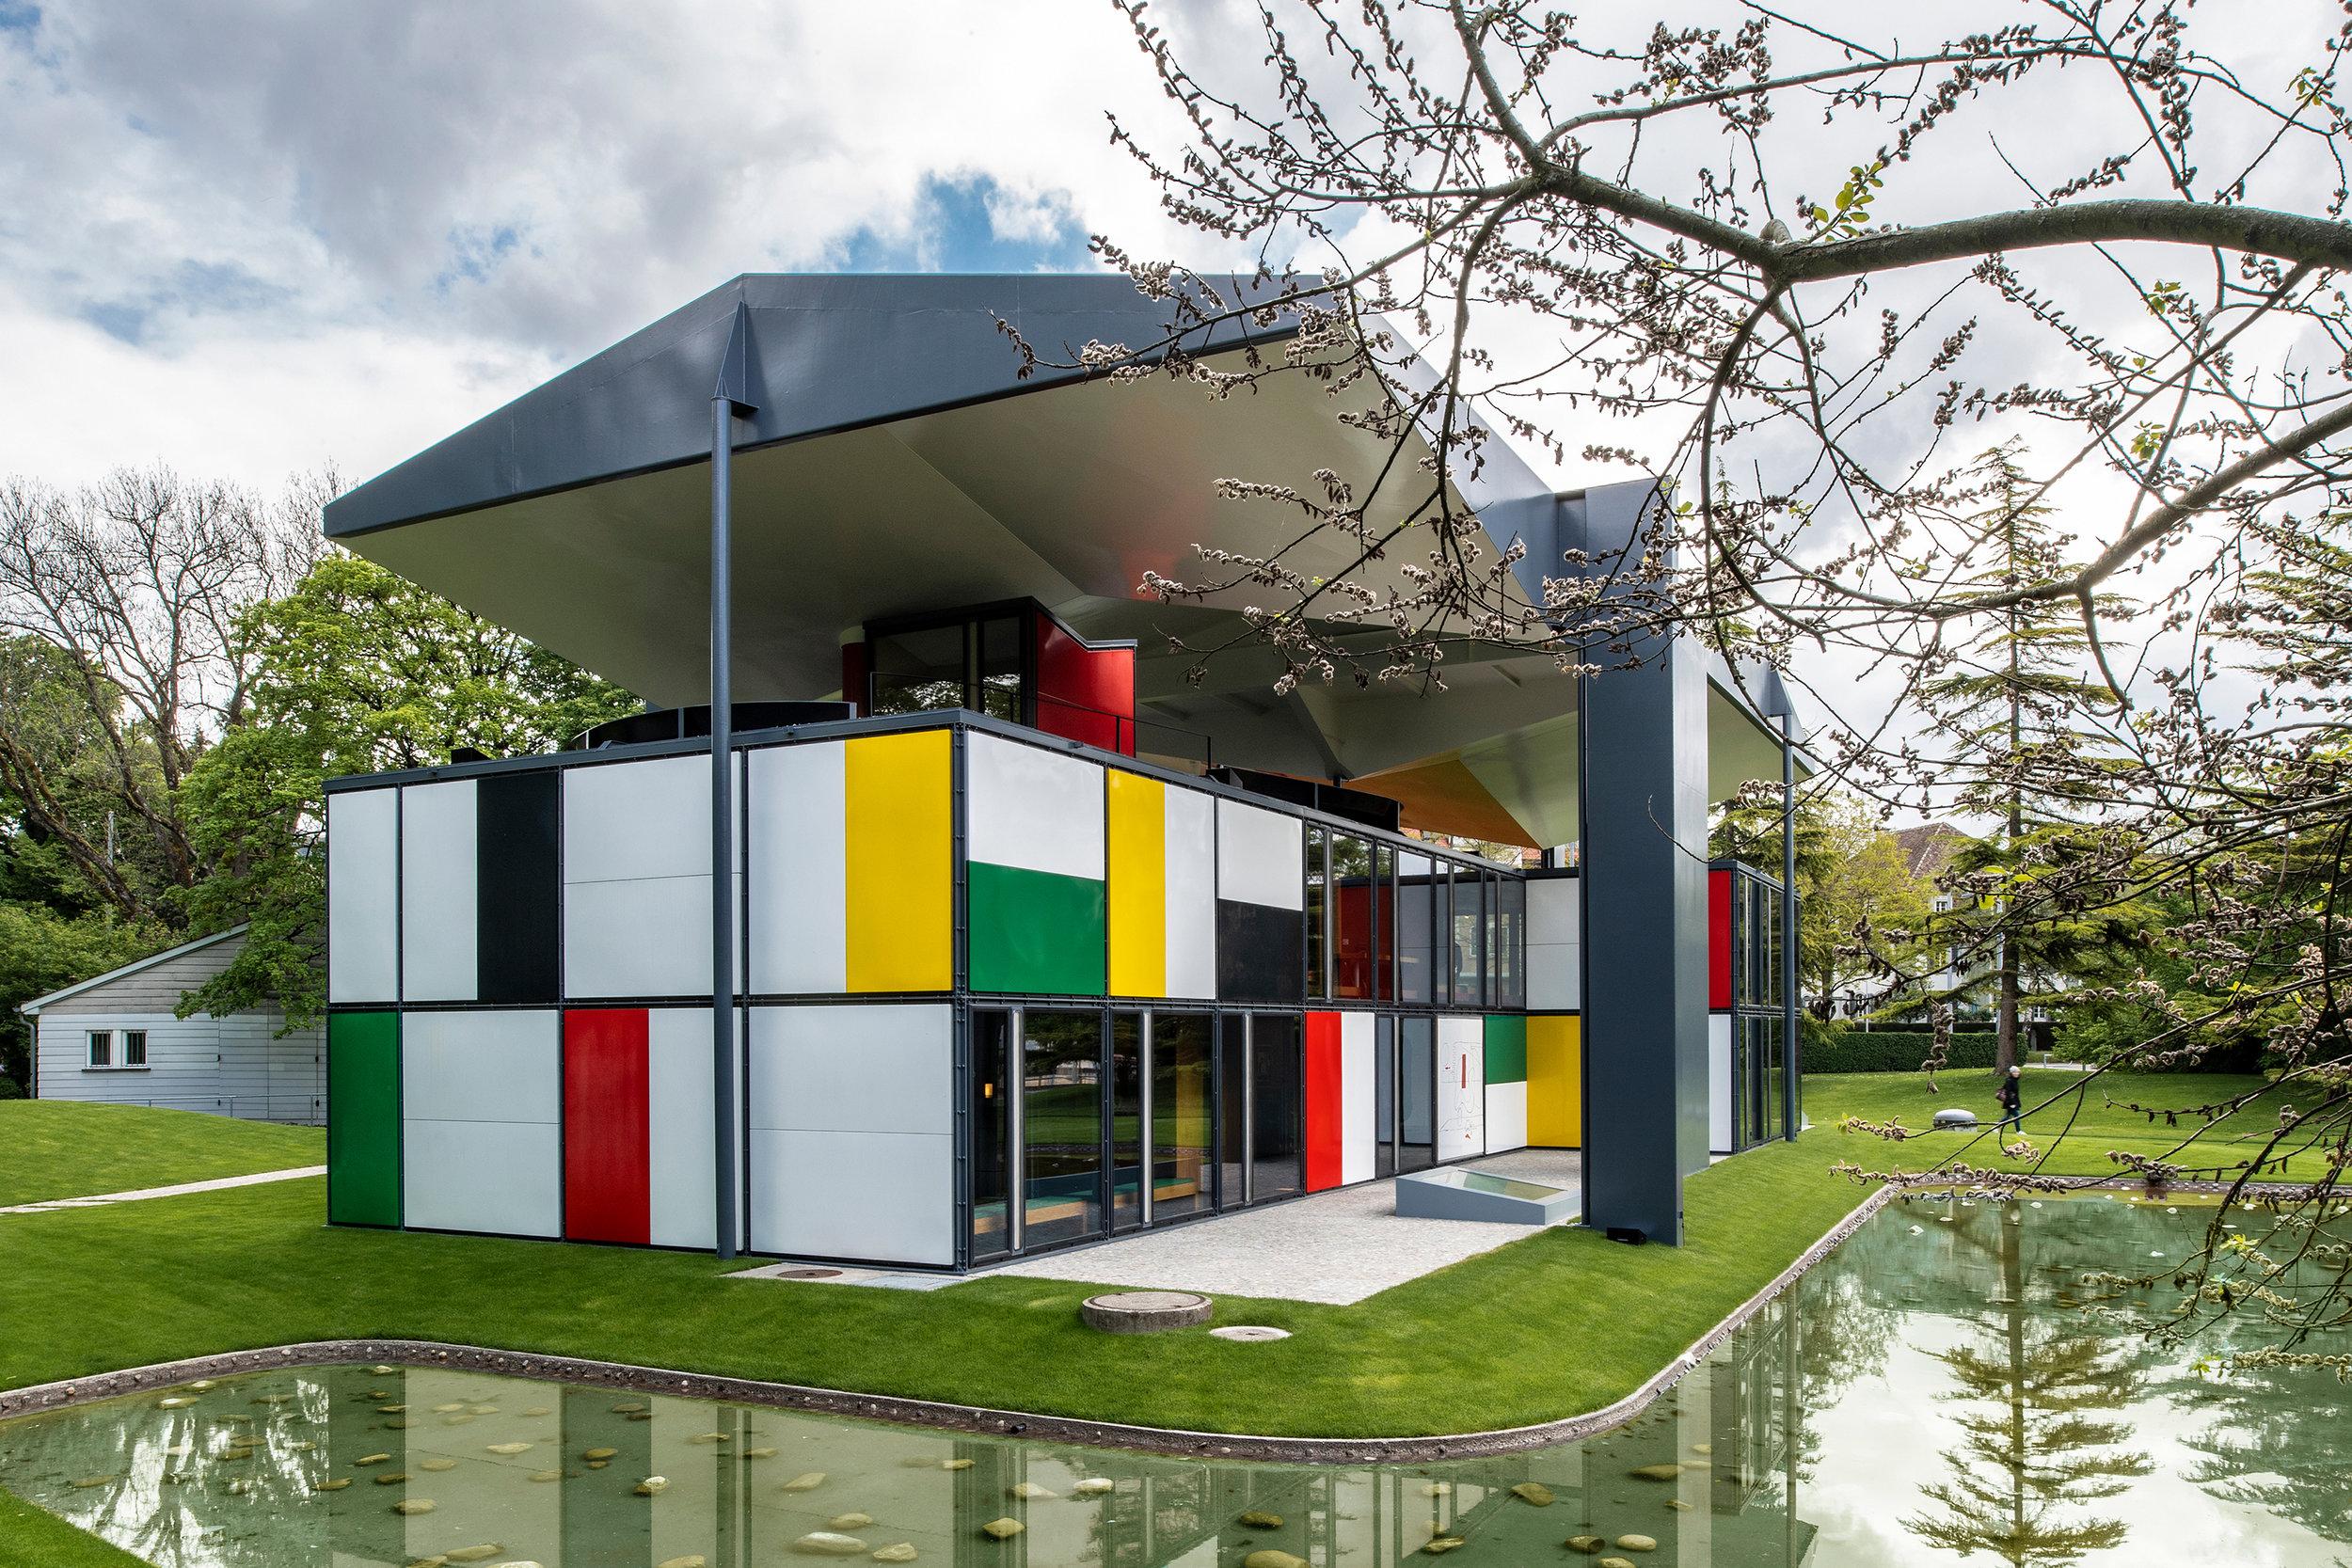 04_Pavillon Le Corbusier.jpg